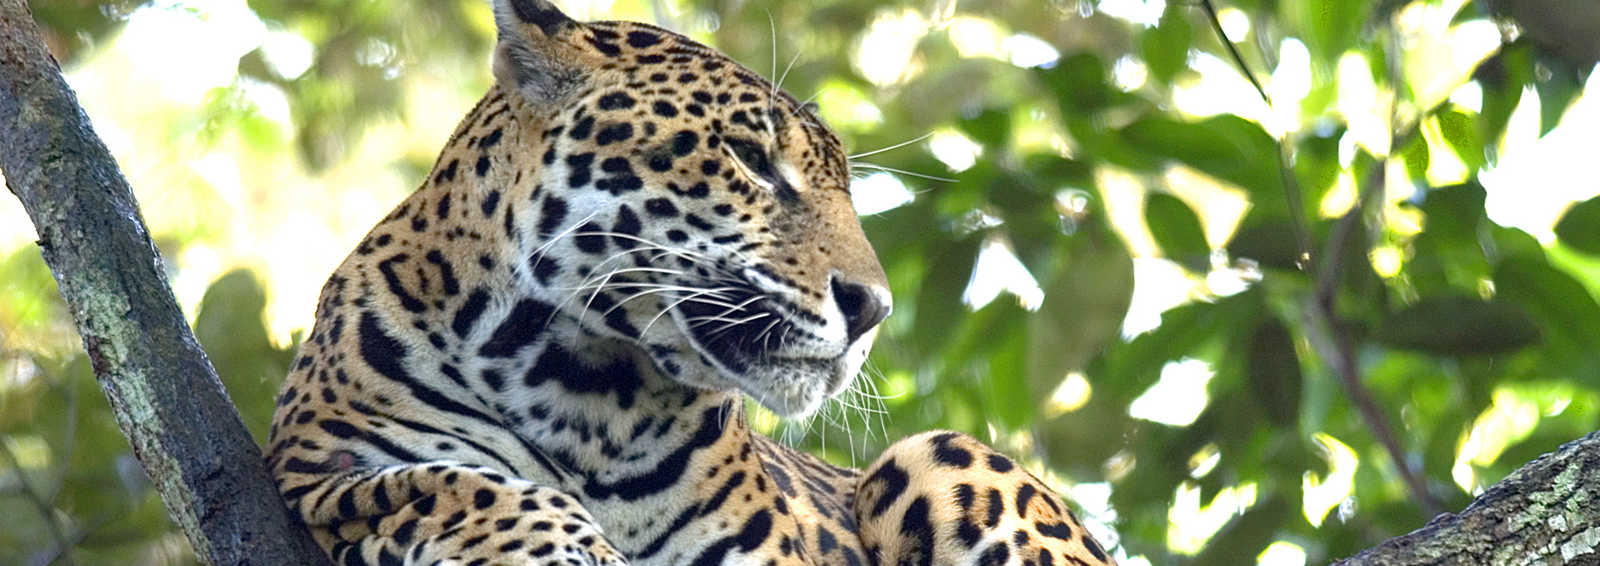 The rare Jaguar in San Ignacio region, Belize